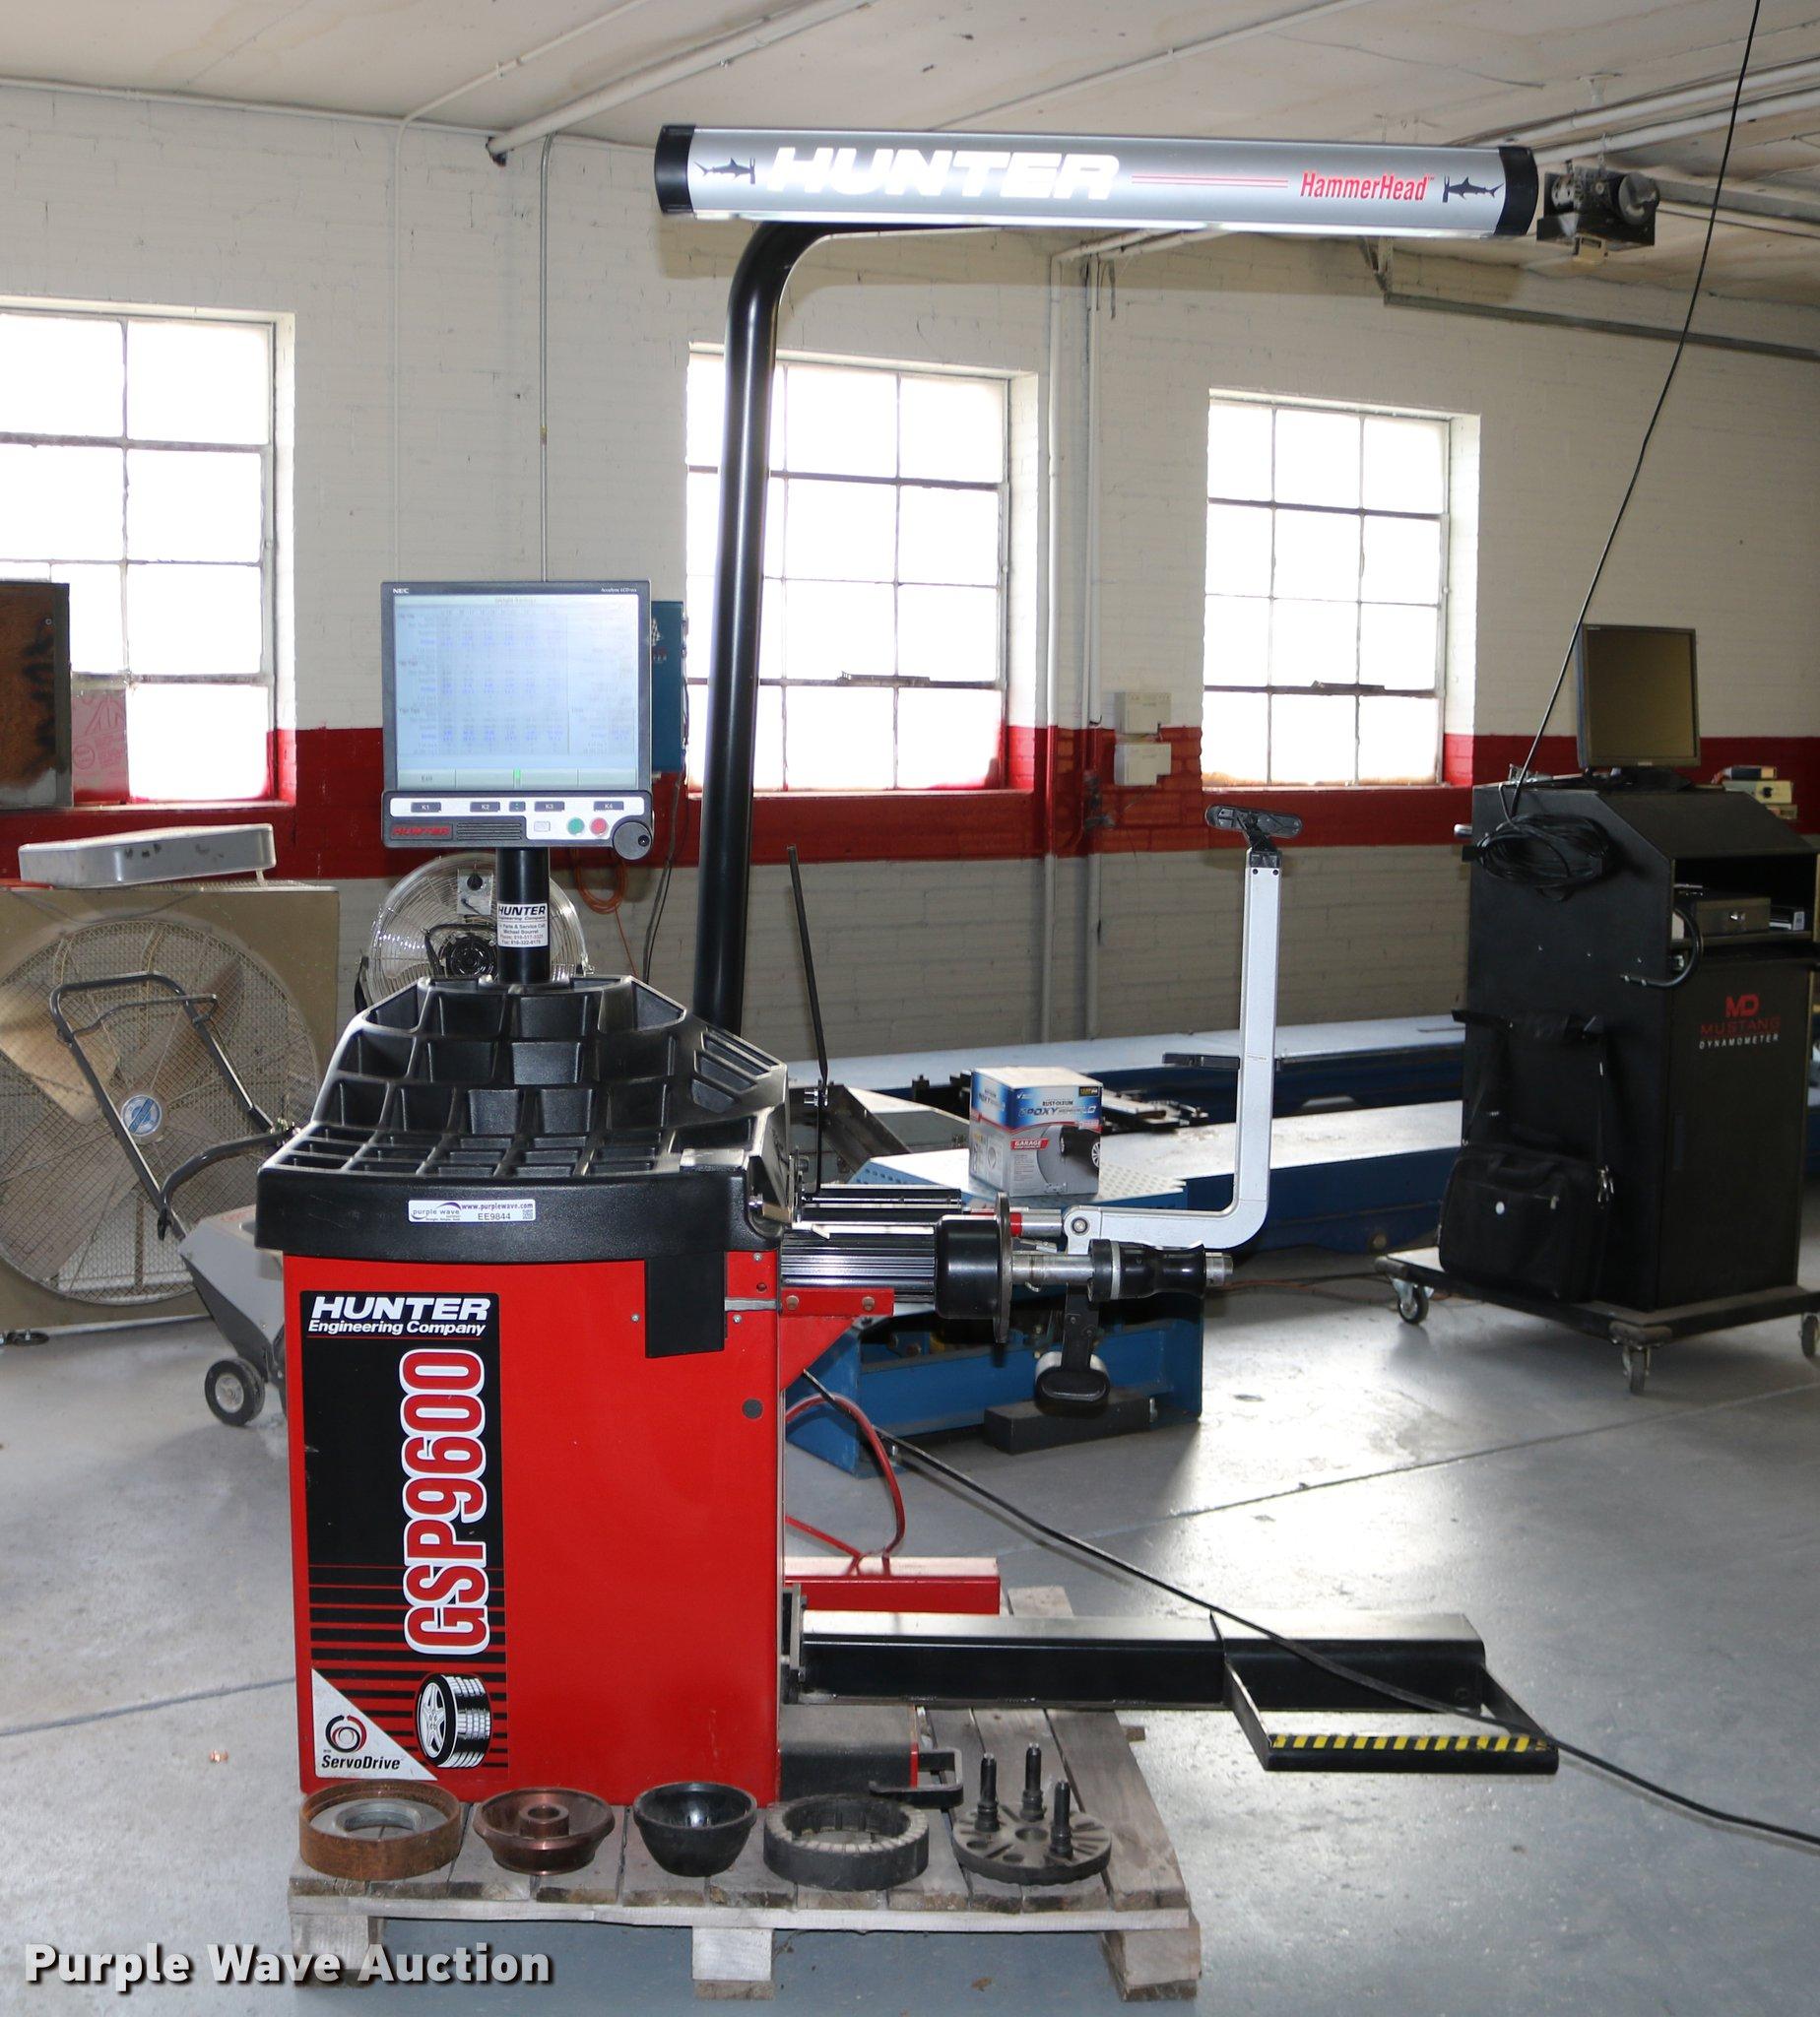 ... Hunter GSP9600 series laser wheel balancer Full size in new window ...